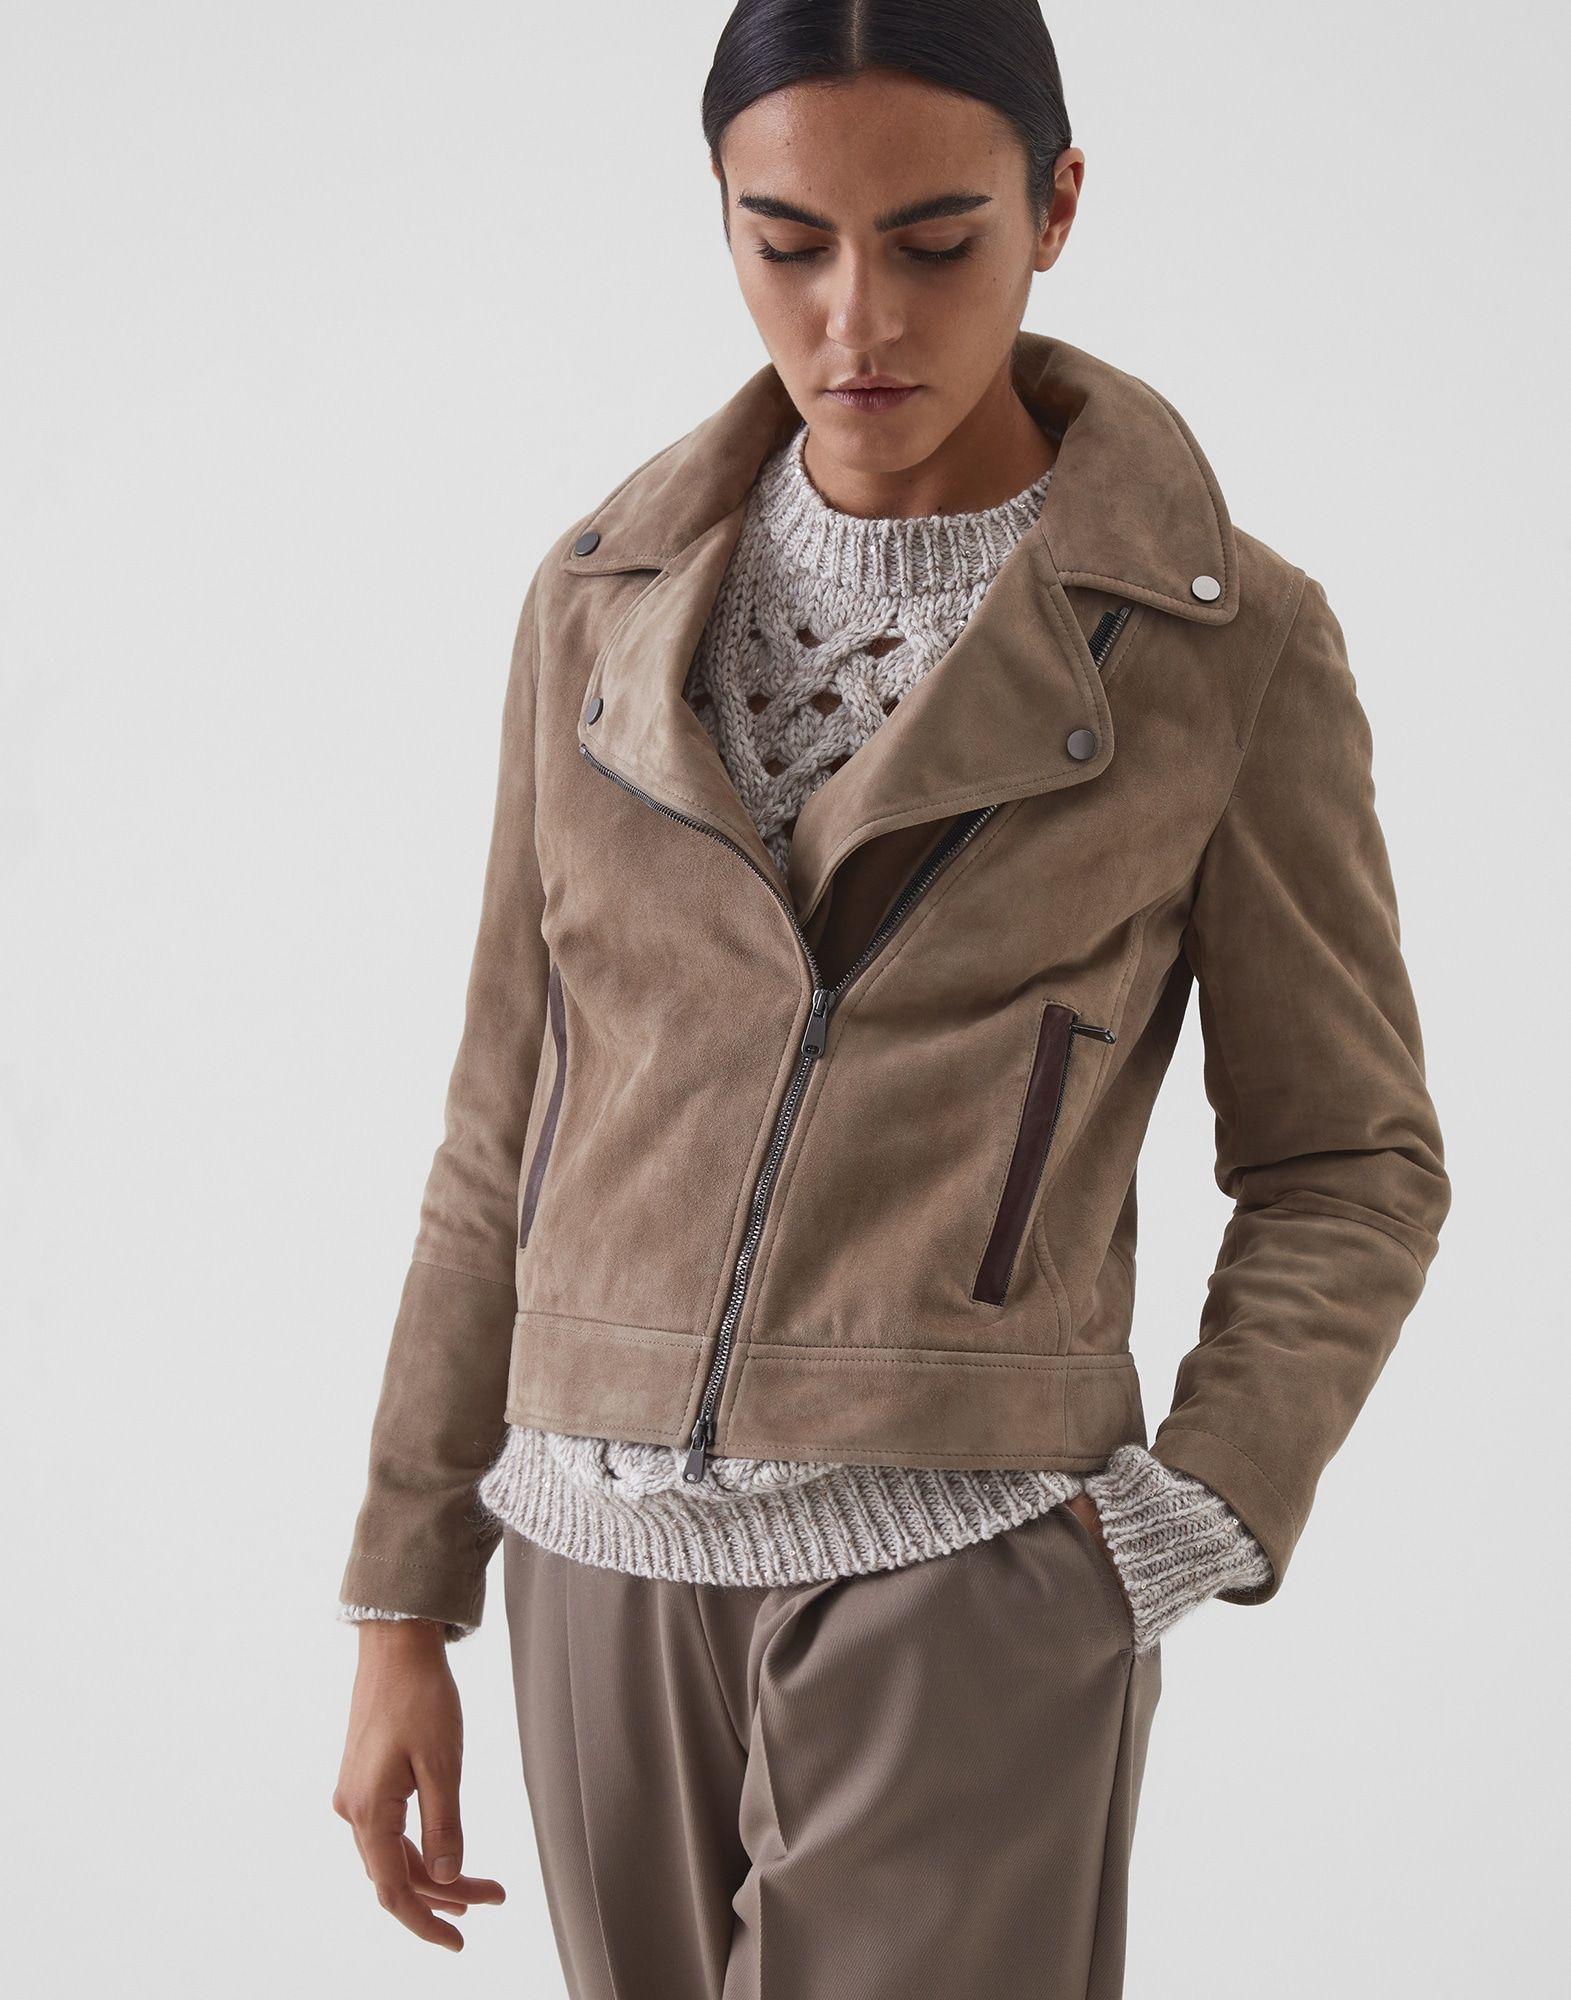 Suede Biker Jacket 202mpcai8969p For Woman Suede Biker Jacket Jackets Biker Jacket Style [ 2000 x 1571 Pixel ]